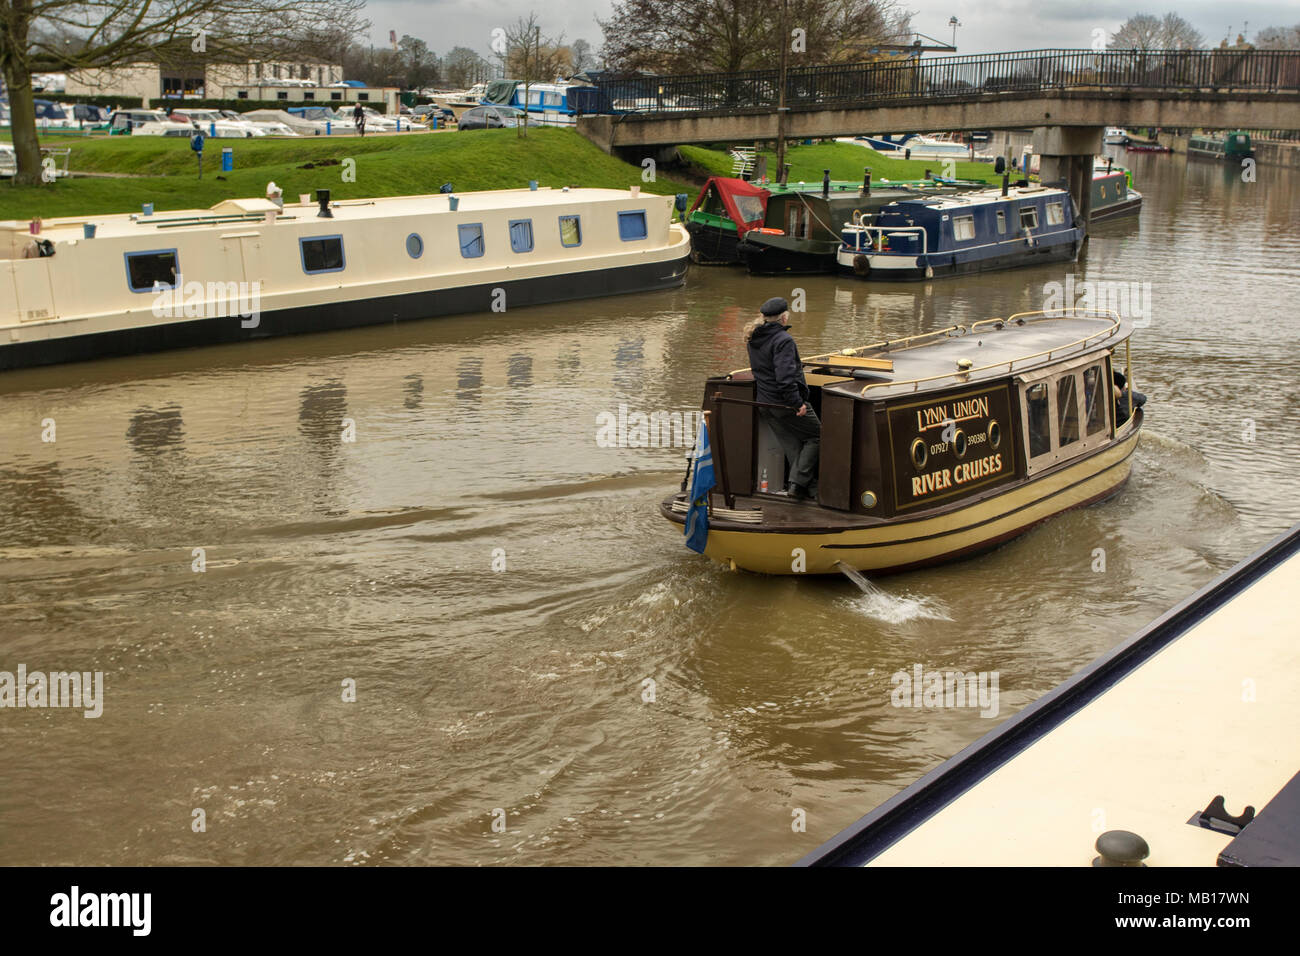 barges on the great ouse at Ely, Cambridgeshire, England, United Kingdom, Europe - Stock Image